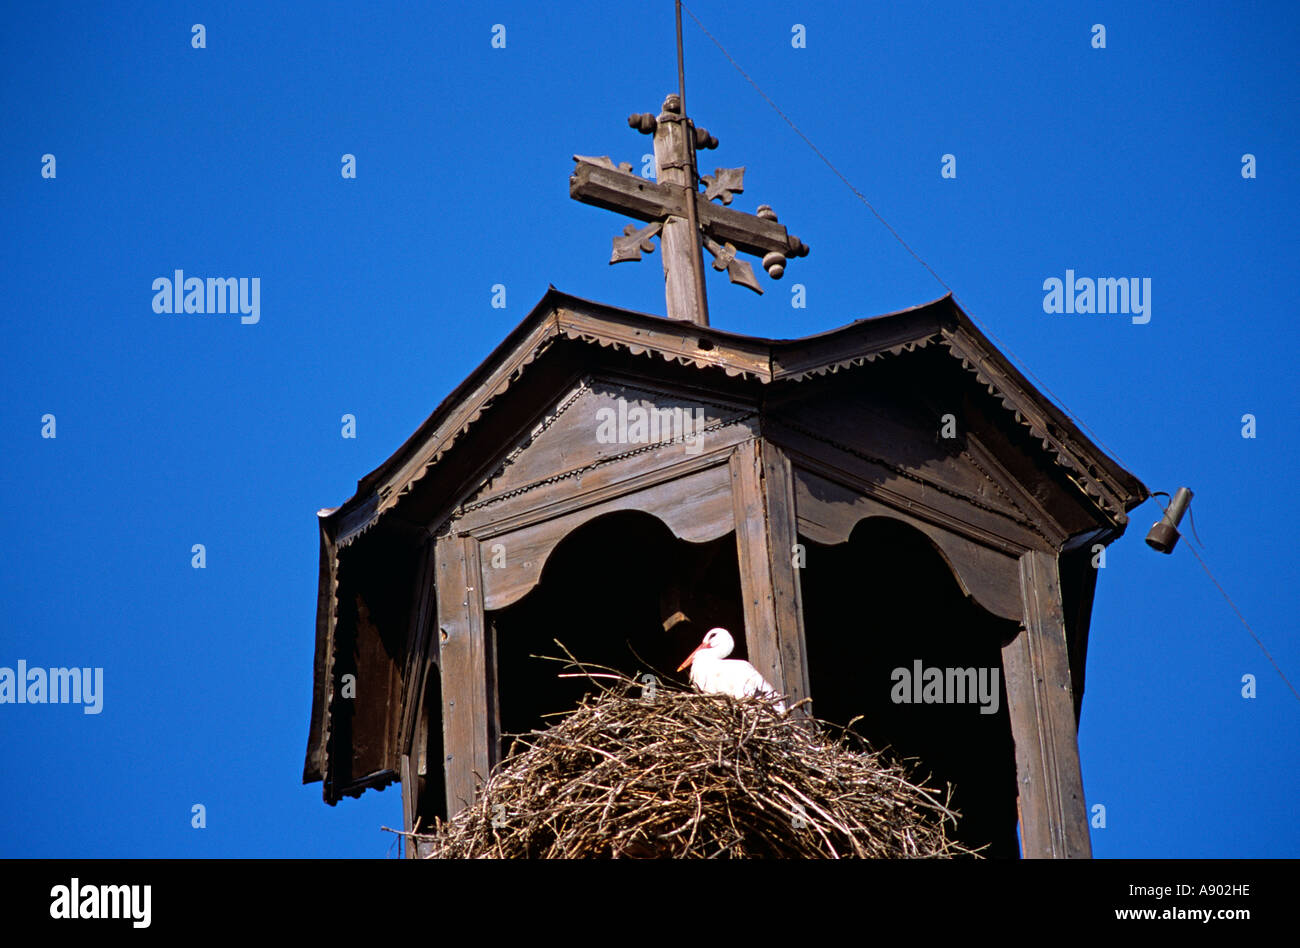 Stork on nest, Holy Trinity Church, Sveta Troitsa Church, clock and bell tower, Bansko, Bulgaria Stock Photo